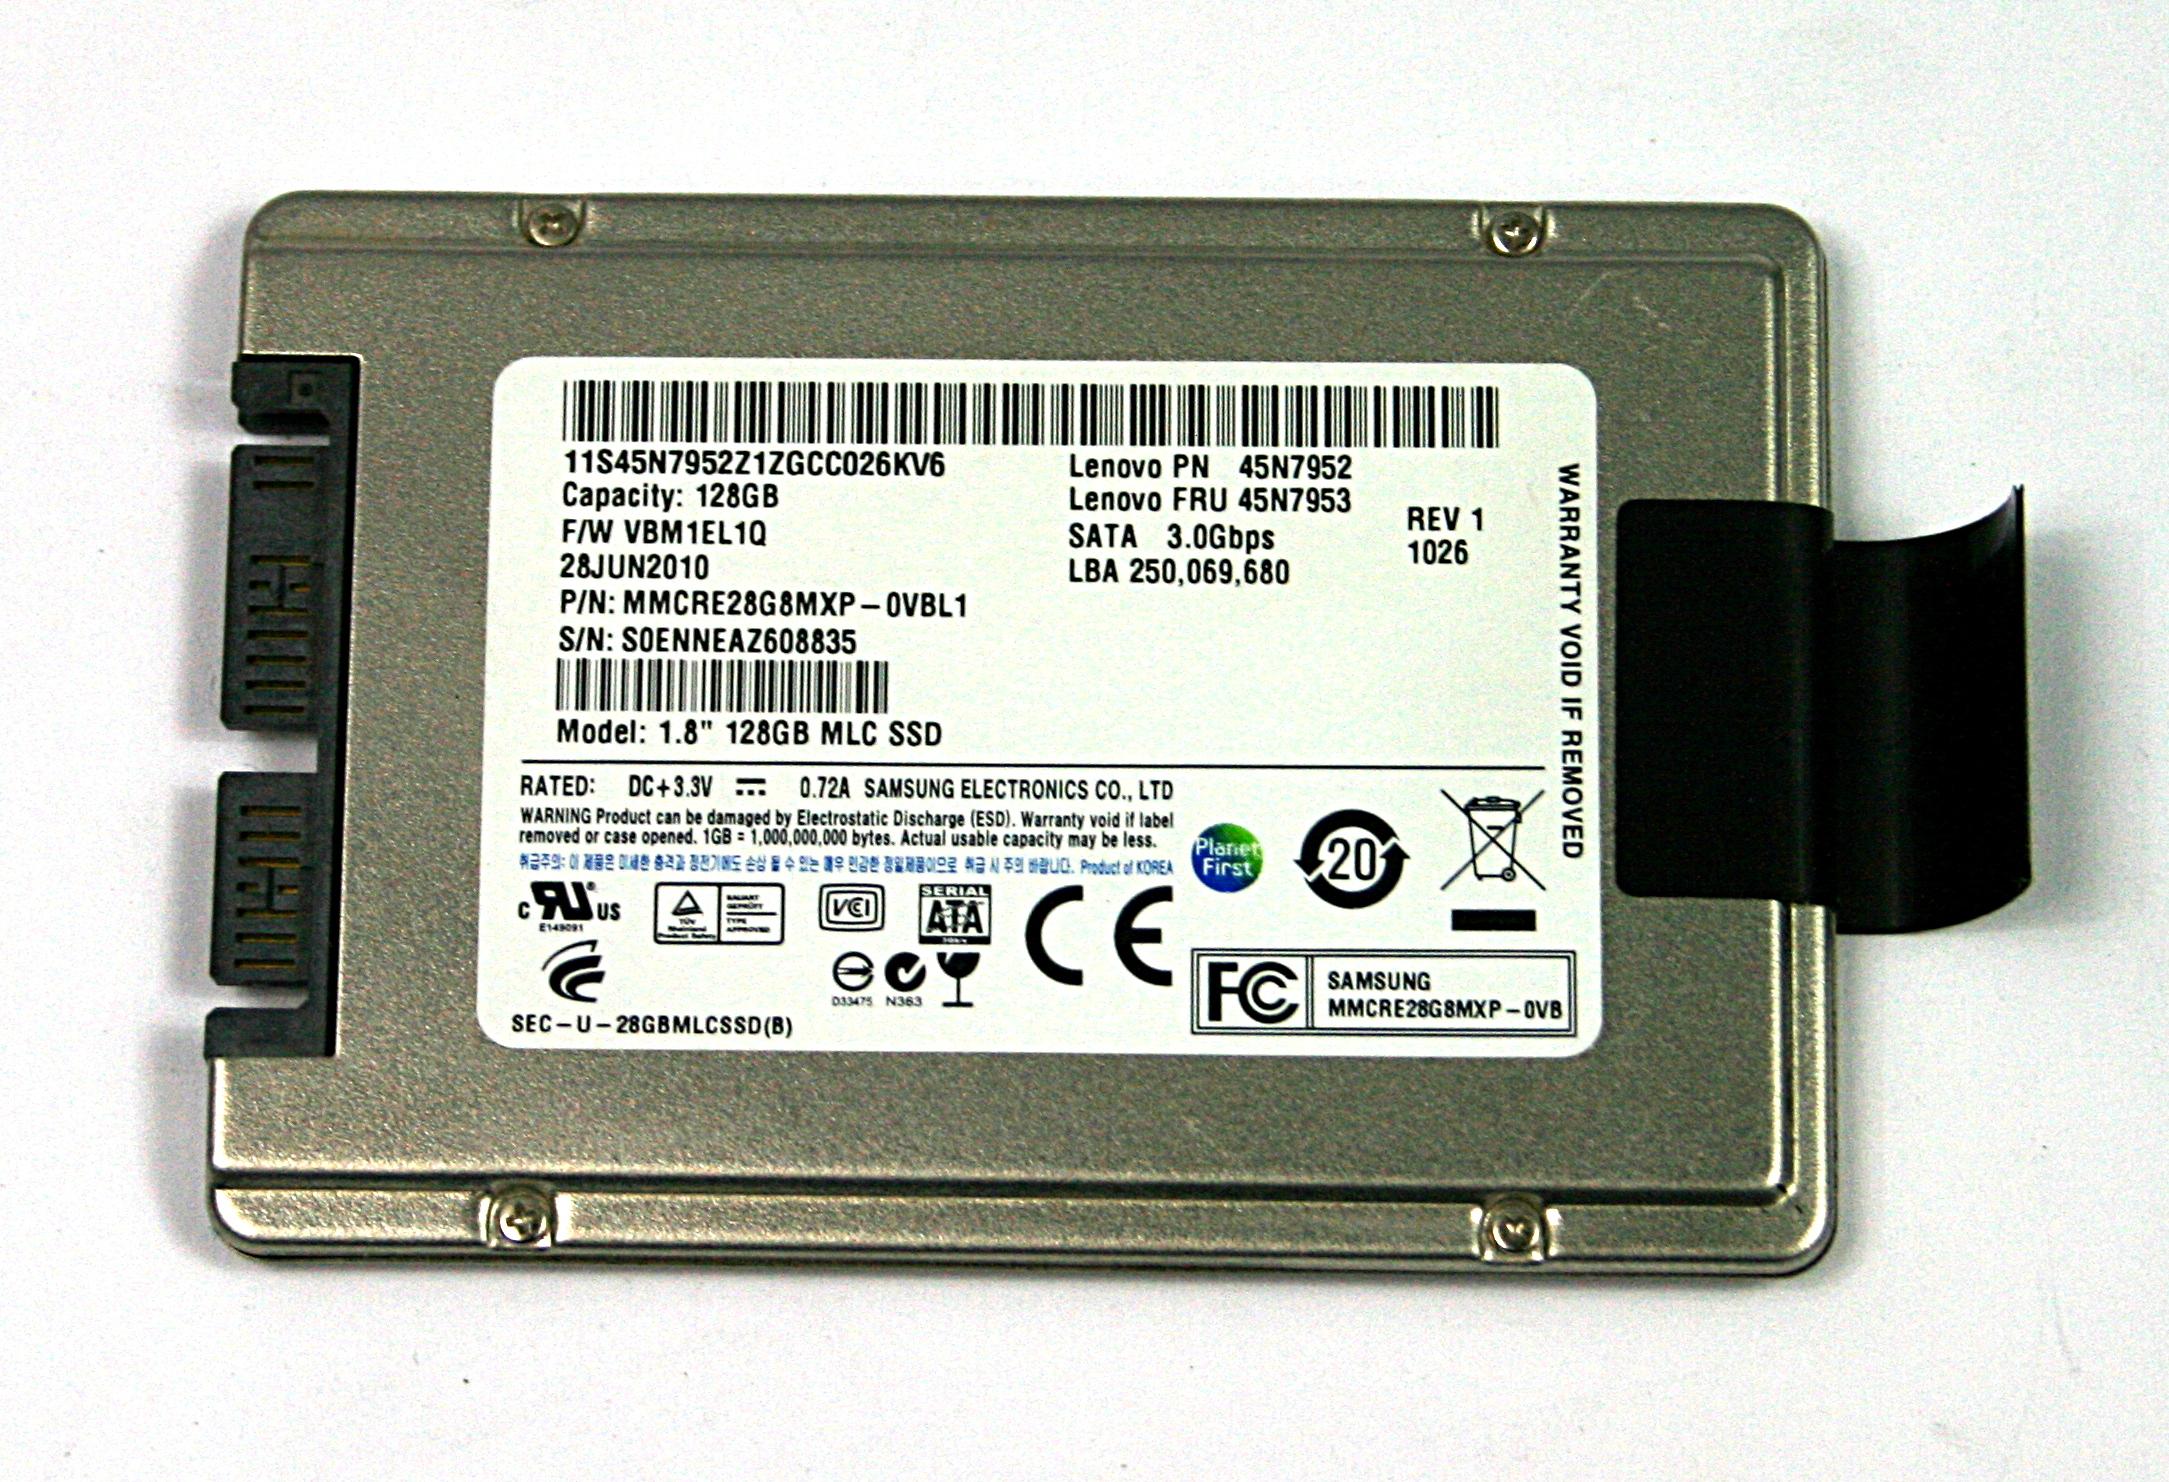 Lenovo 45N7953 Samsung 128GB 1 8